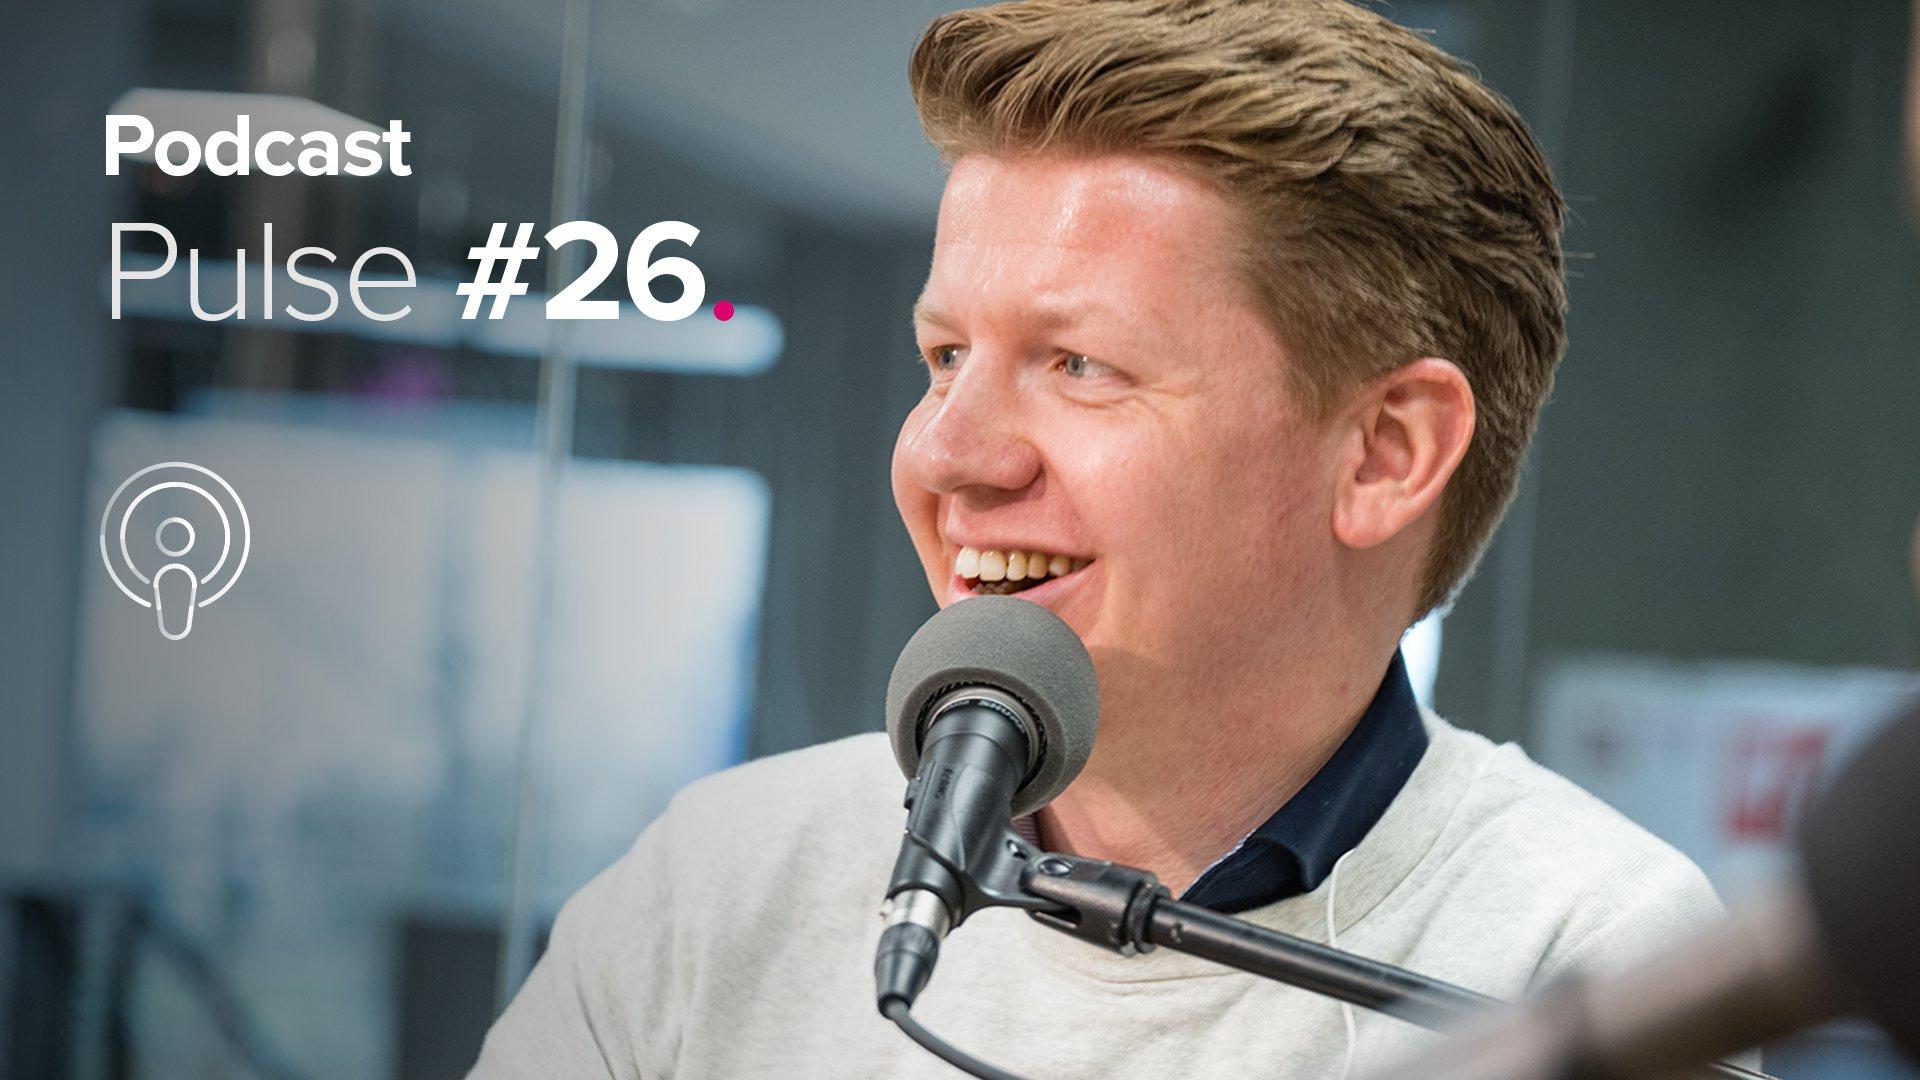 Podcast Digital Brains Pulse #26